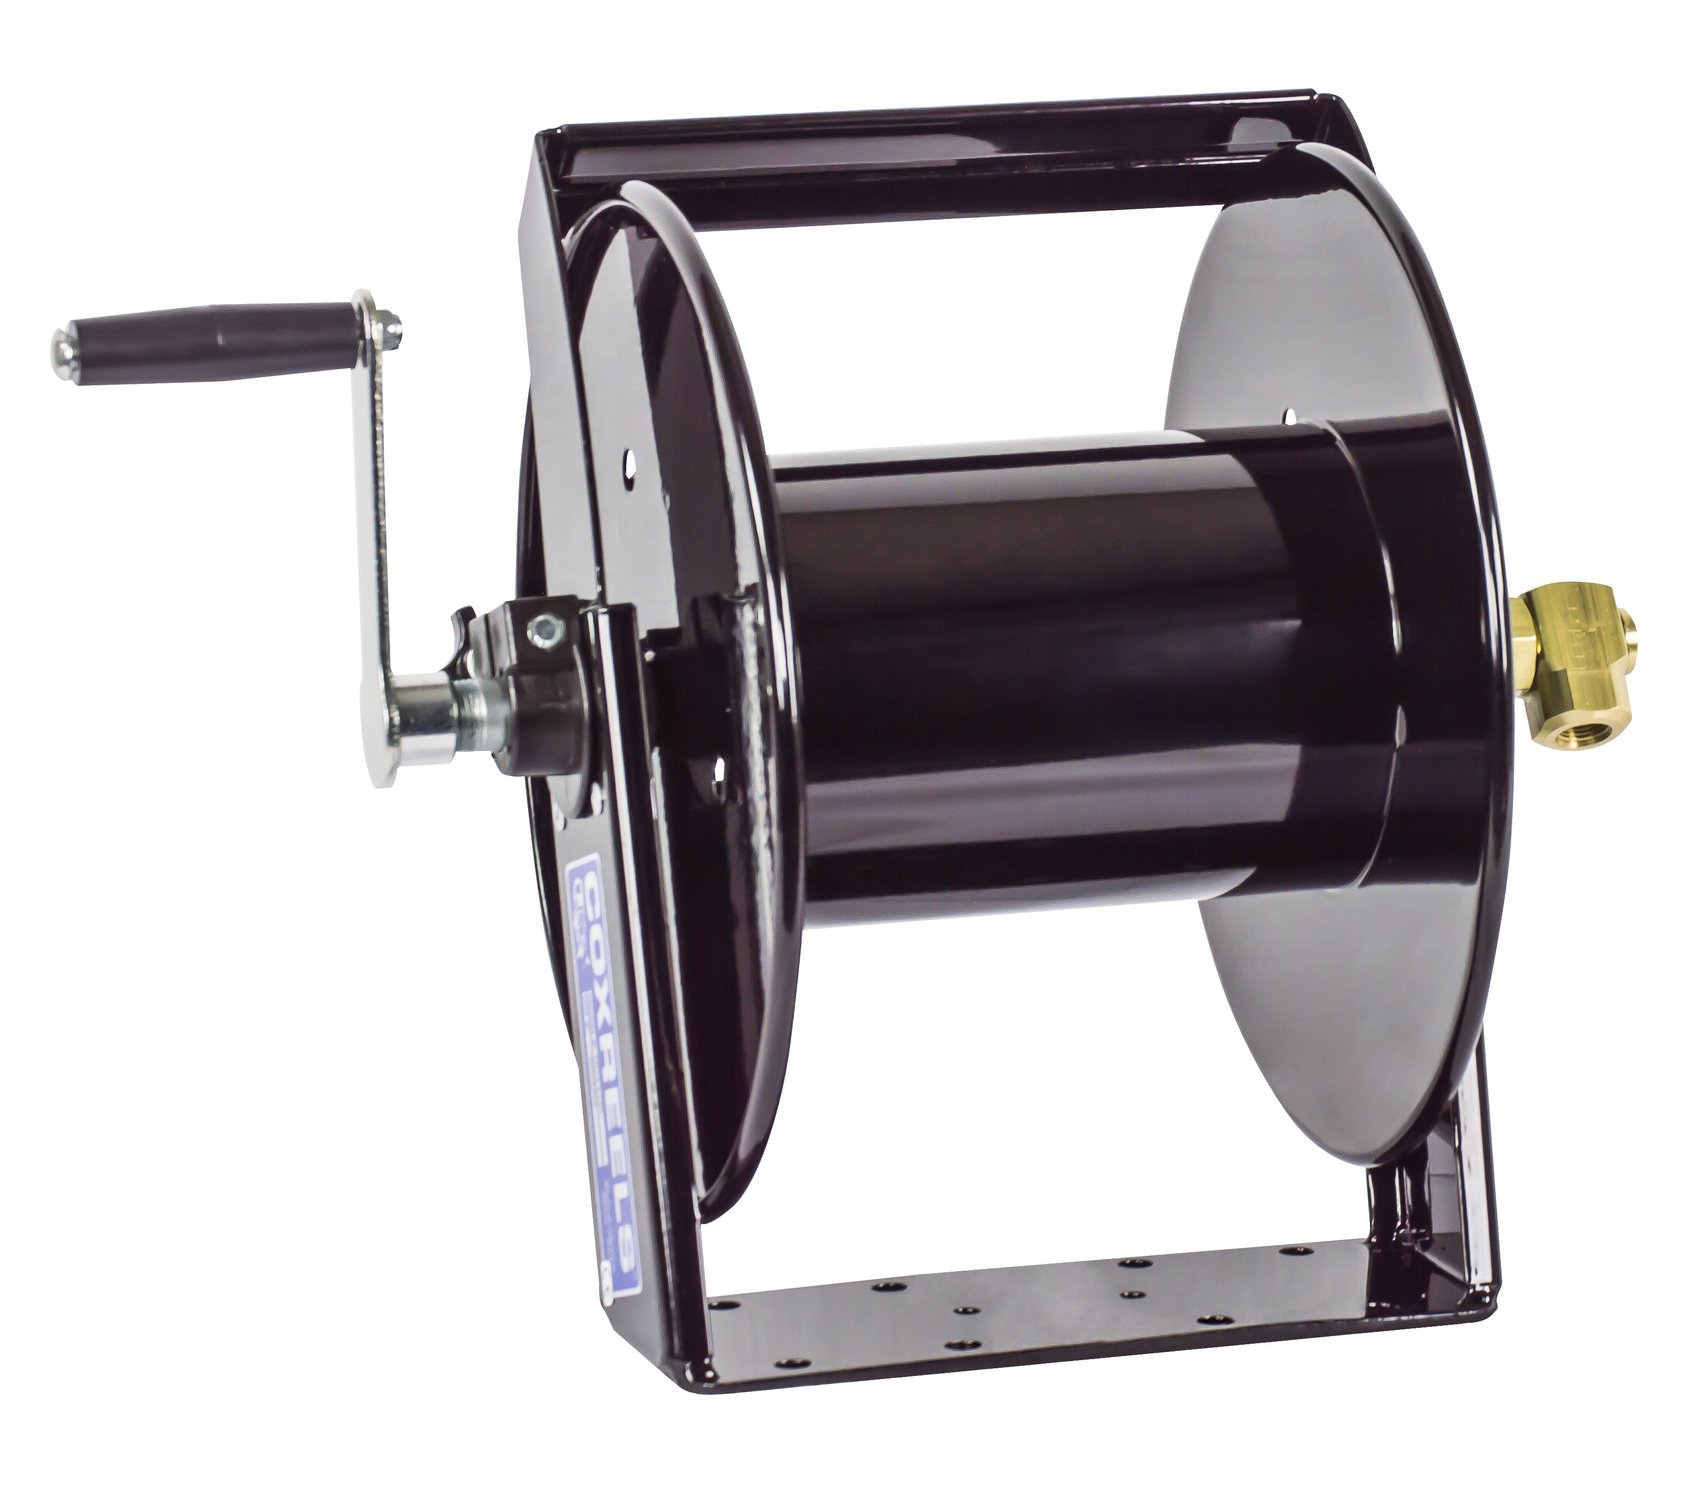 Coxreels SM17-3-250 Swivel Mount Hand Crank Hose Reel: 3/8'' I.D., 250' hose capacity, less hose, 4000 PSI